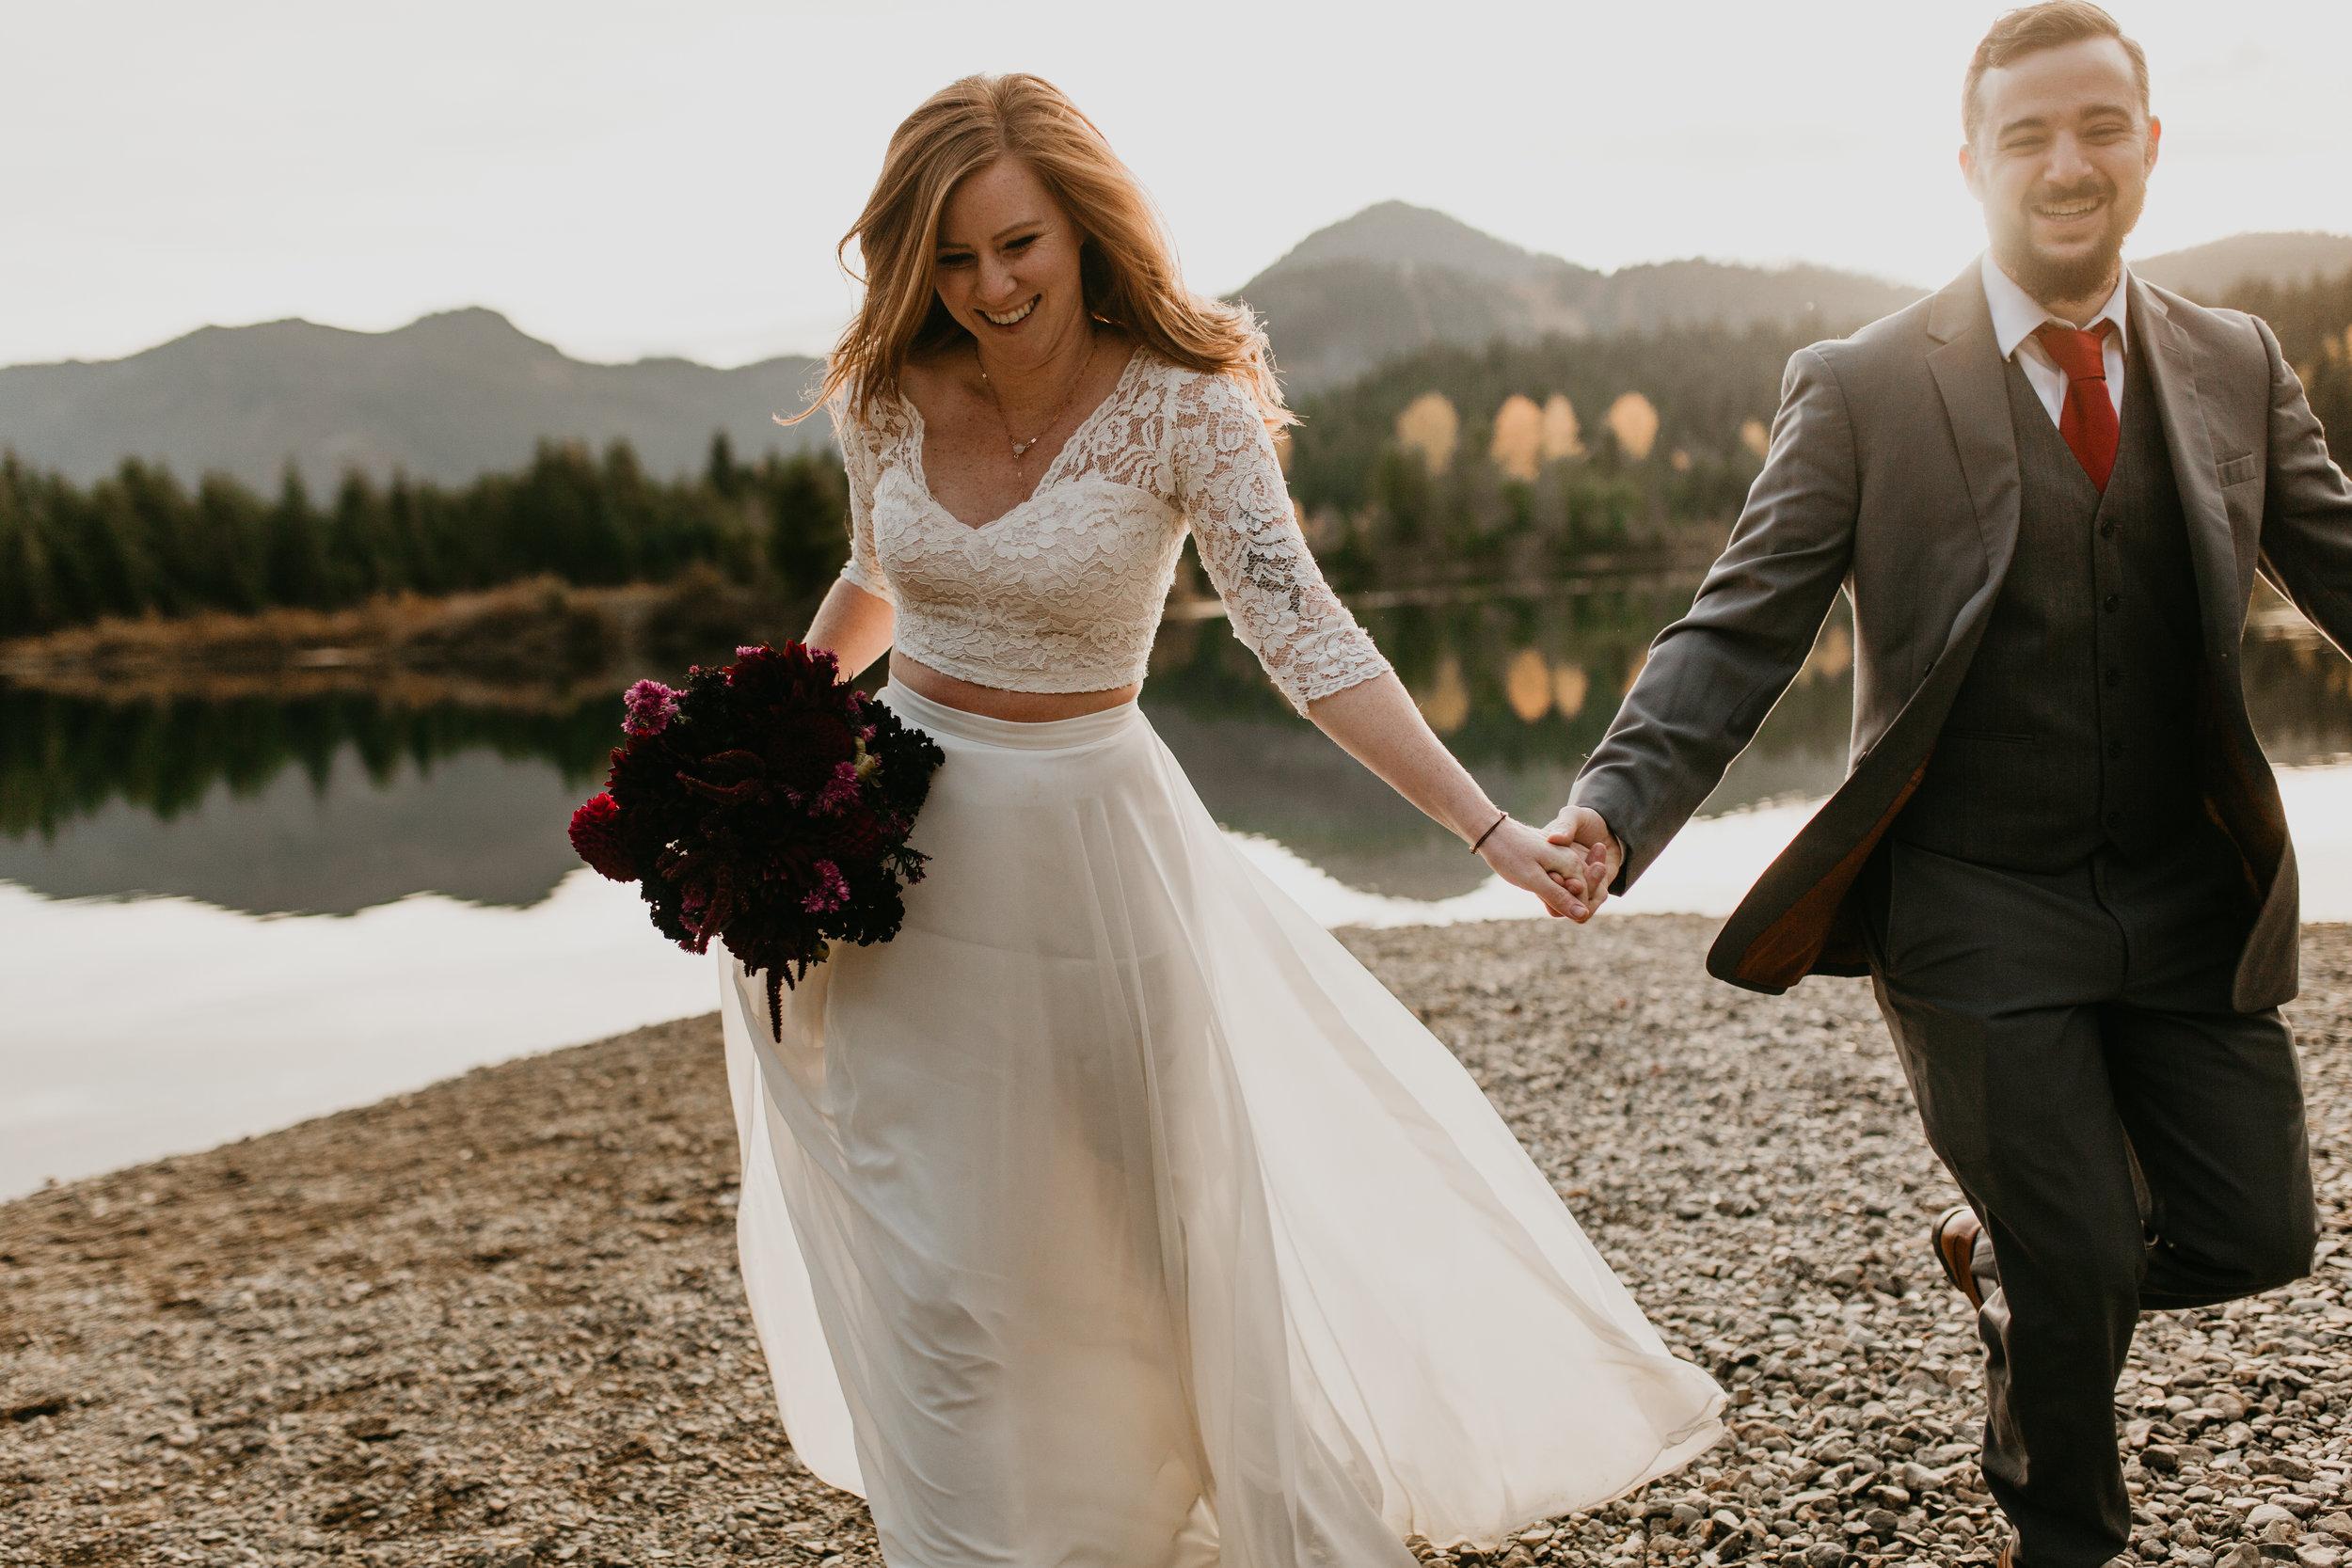 nicole-daacke-photography-mountain-view-elopement-at-gold-creek-pond-snoqualmie-washington-wa-elopement-photographer-photography-adventure-elopement-in-washington-fall-lakeside-golden-sunset-boho-fun-bride-0432.jpg